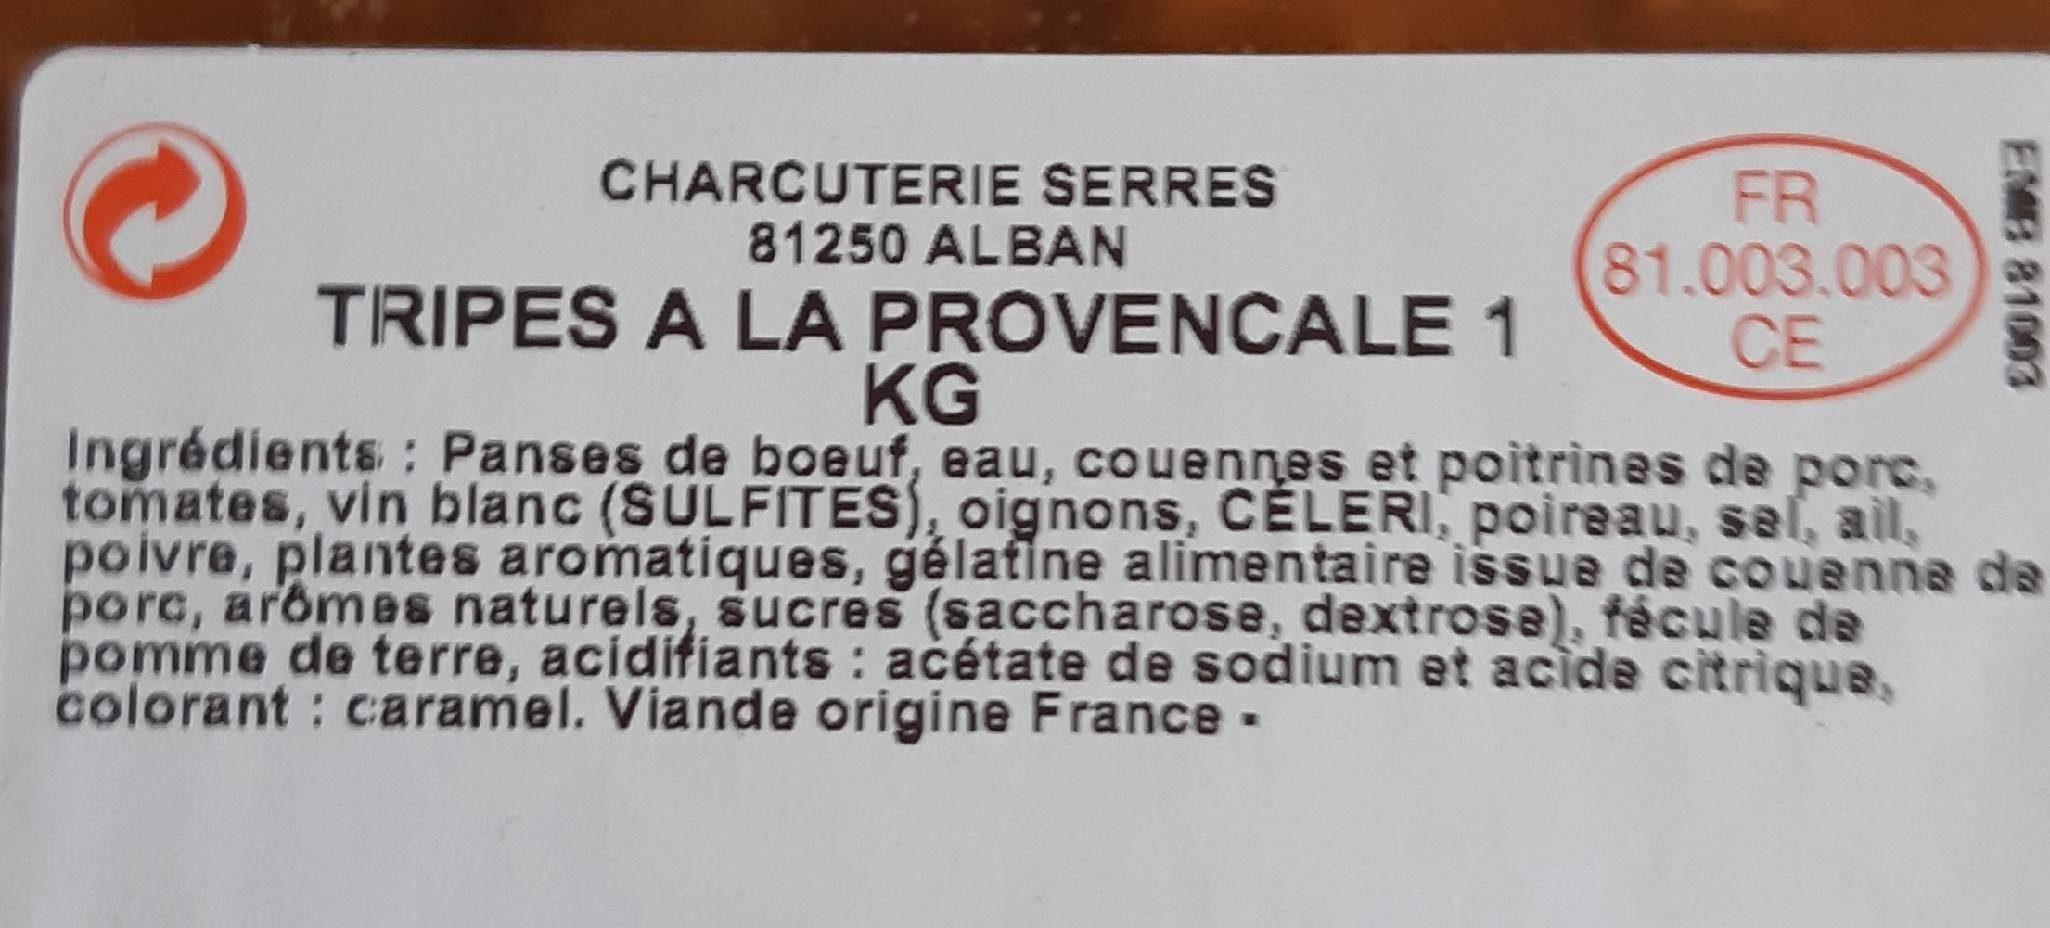 Tripes à la provençale - Ingrediënten - fr